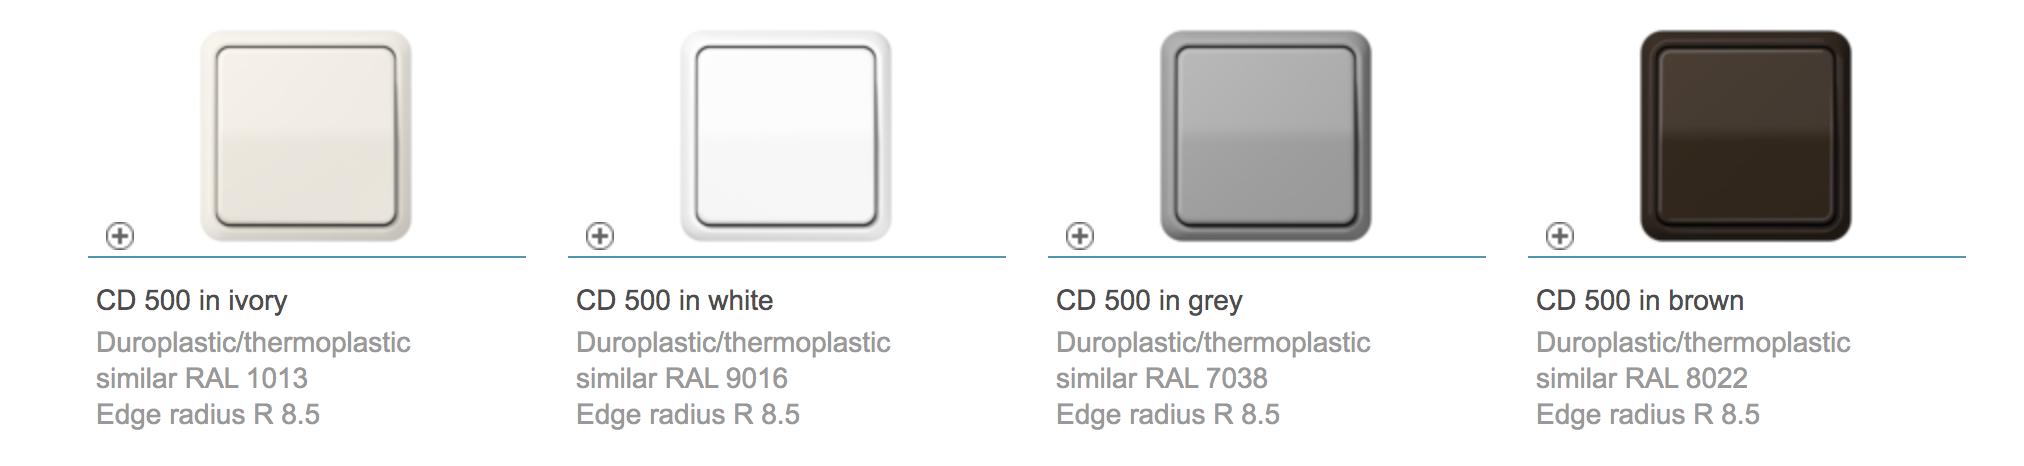 color CD-500